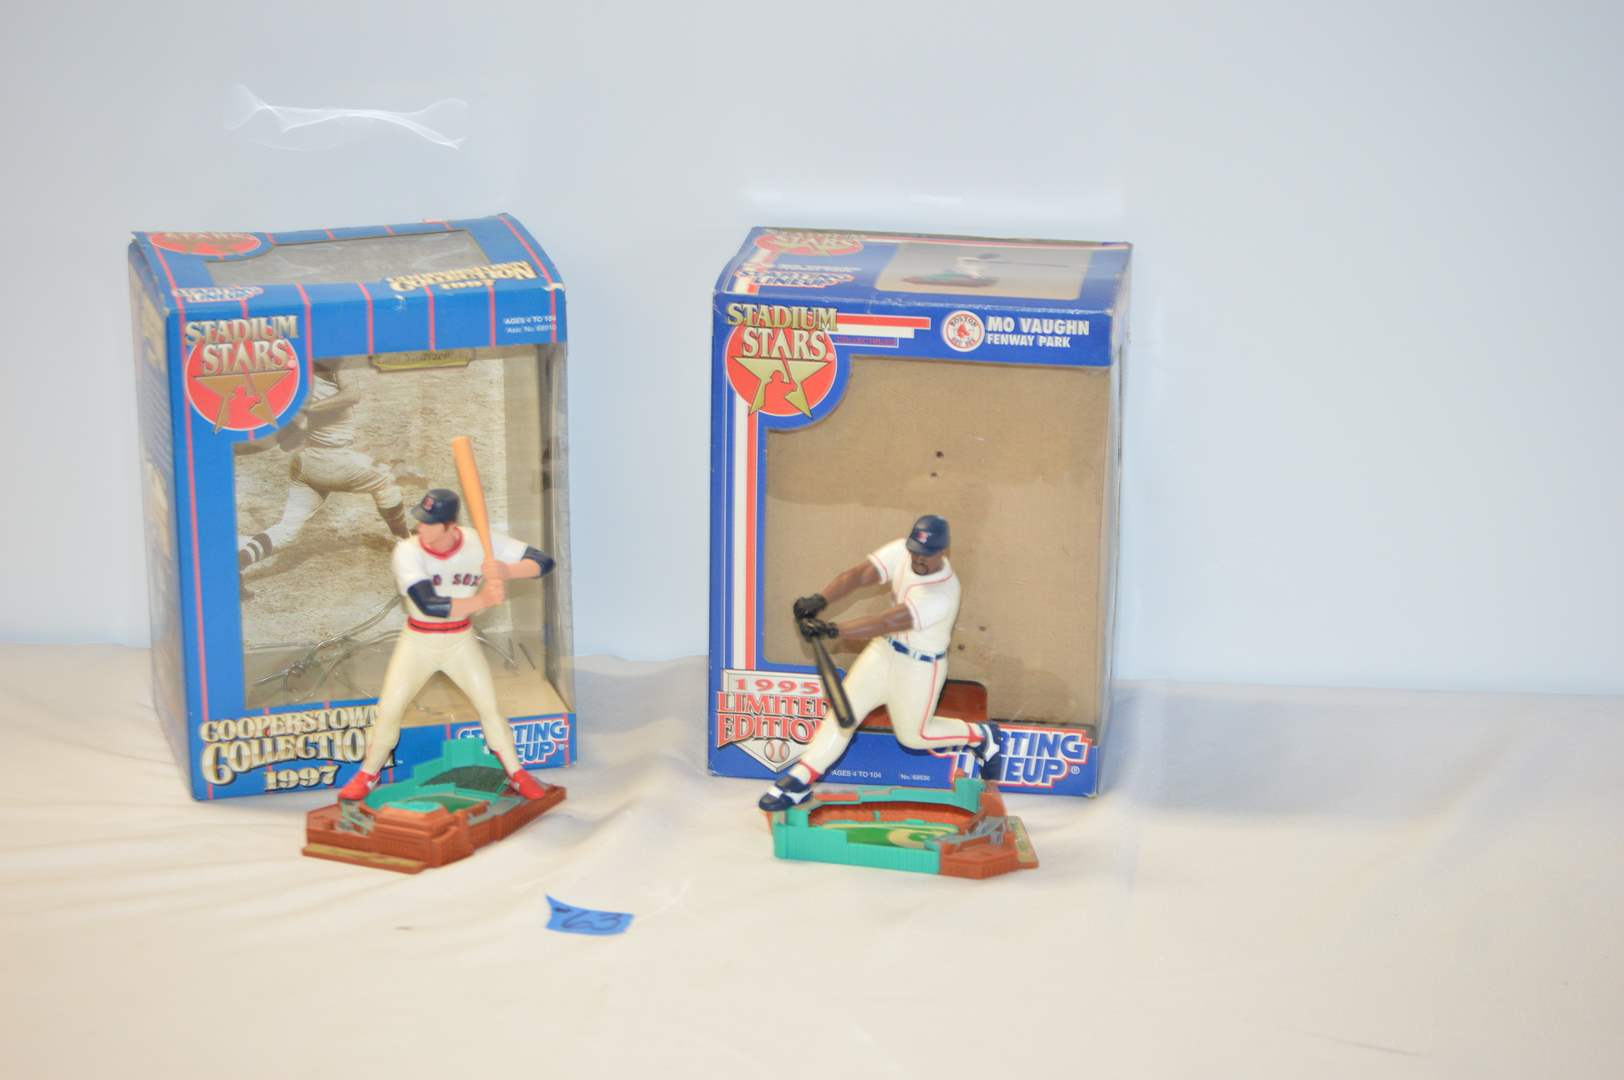 "Lot # 63 2 Starting Lineup  ""Stadium Stars"" Boston Red Sox Figures - Mo Vaughn and Carl Yastrzemski  (main image)"